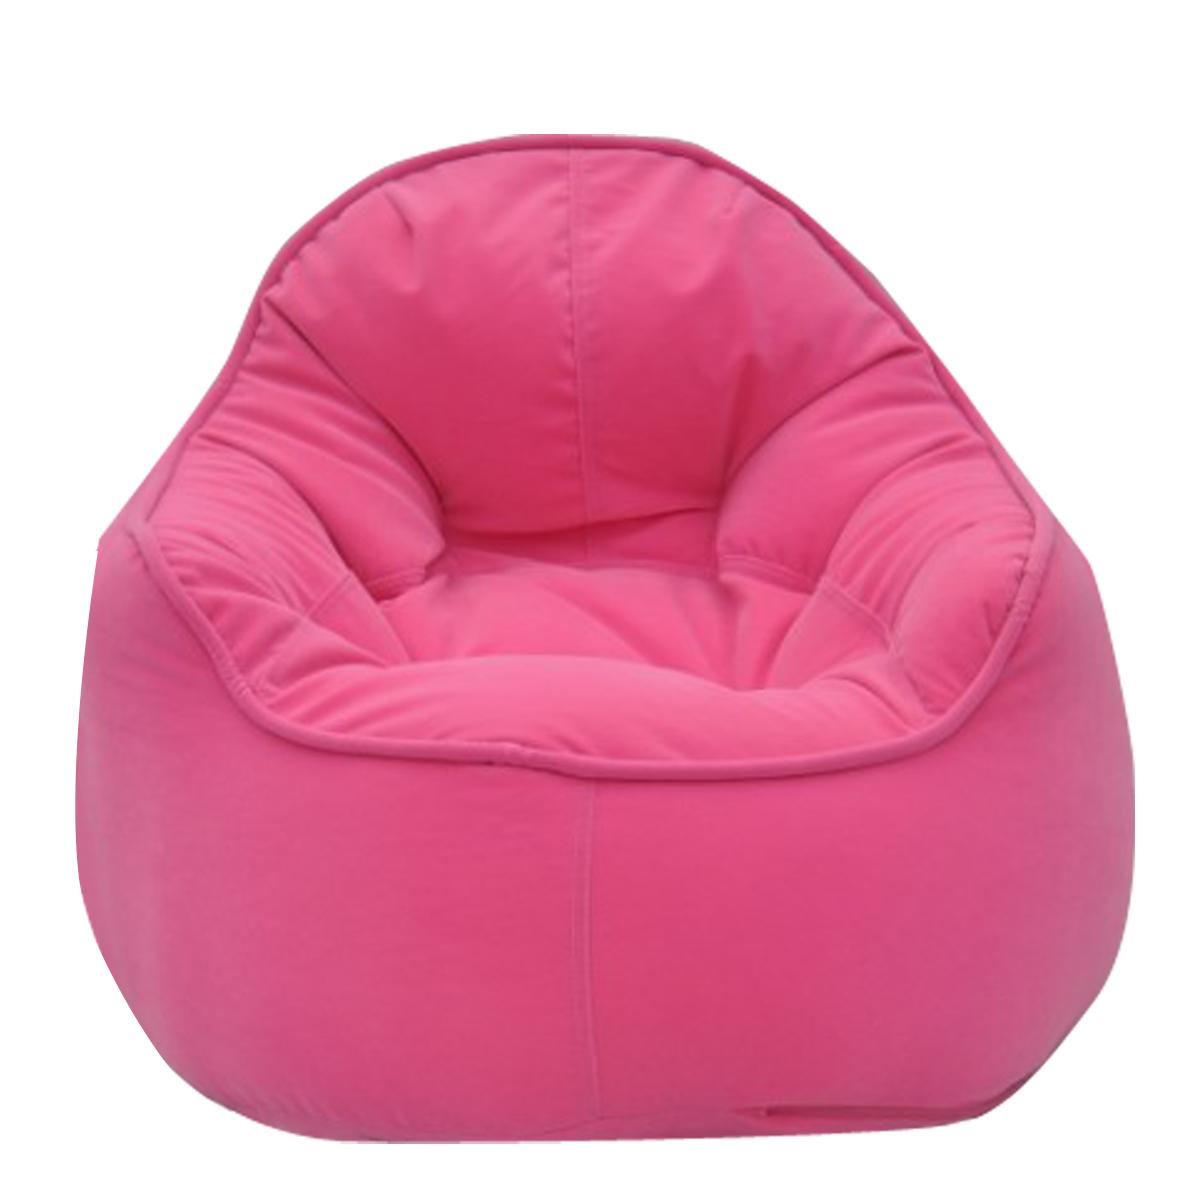 mini bean bag chair best desk for back pain beanbag chairs